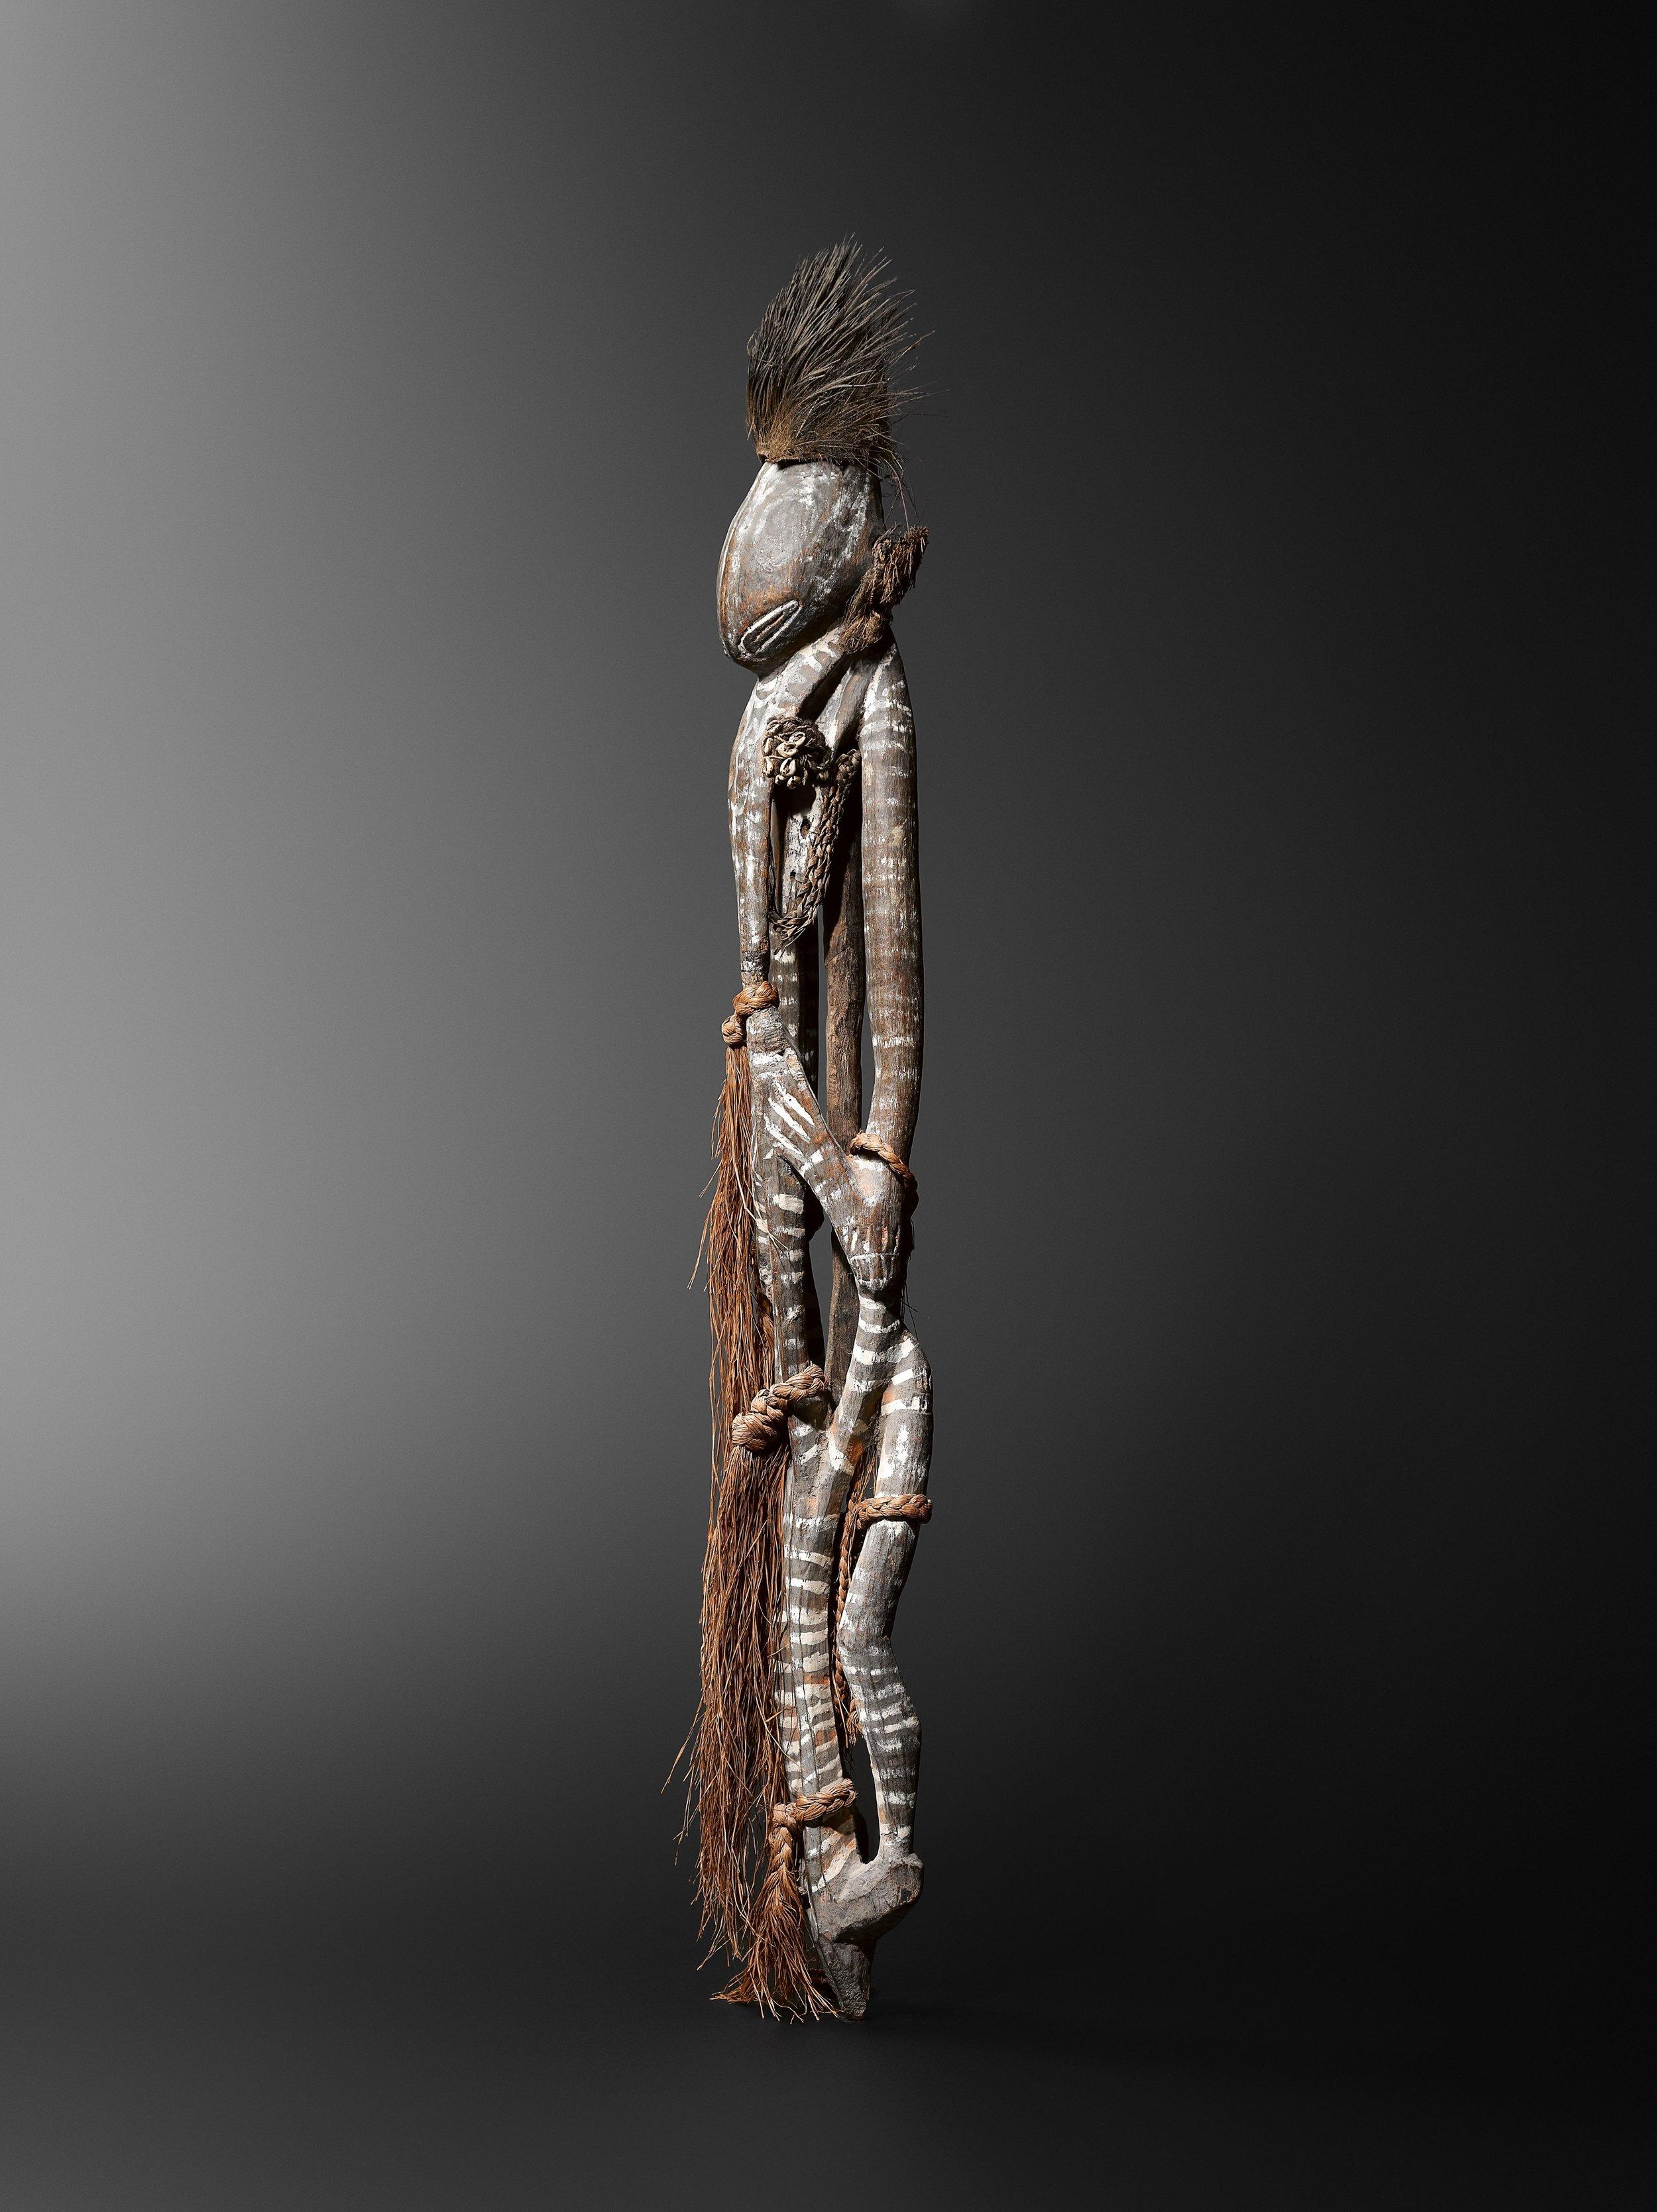 Cult figure,  ulitamano.  Angoram vicinity, lower Sepik. Wood, fibre, cassowary feathers and pigments. 82 cm. Jef Vanderstraete, Lasne, Belgium. © Hugues Dubois, Brussels/Paris